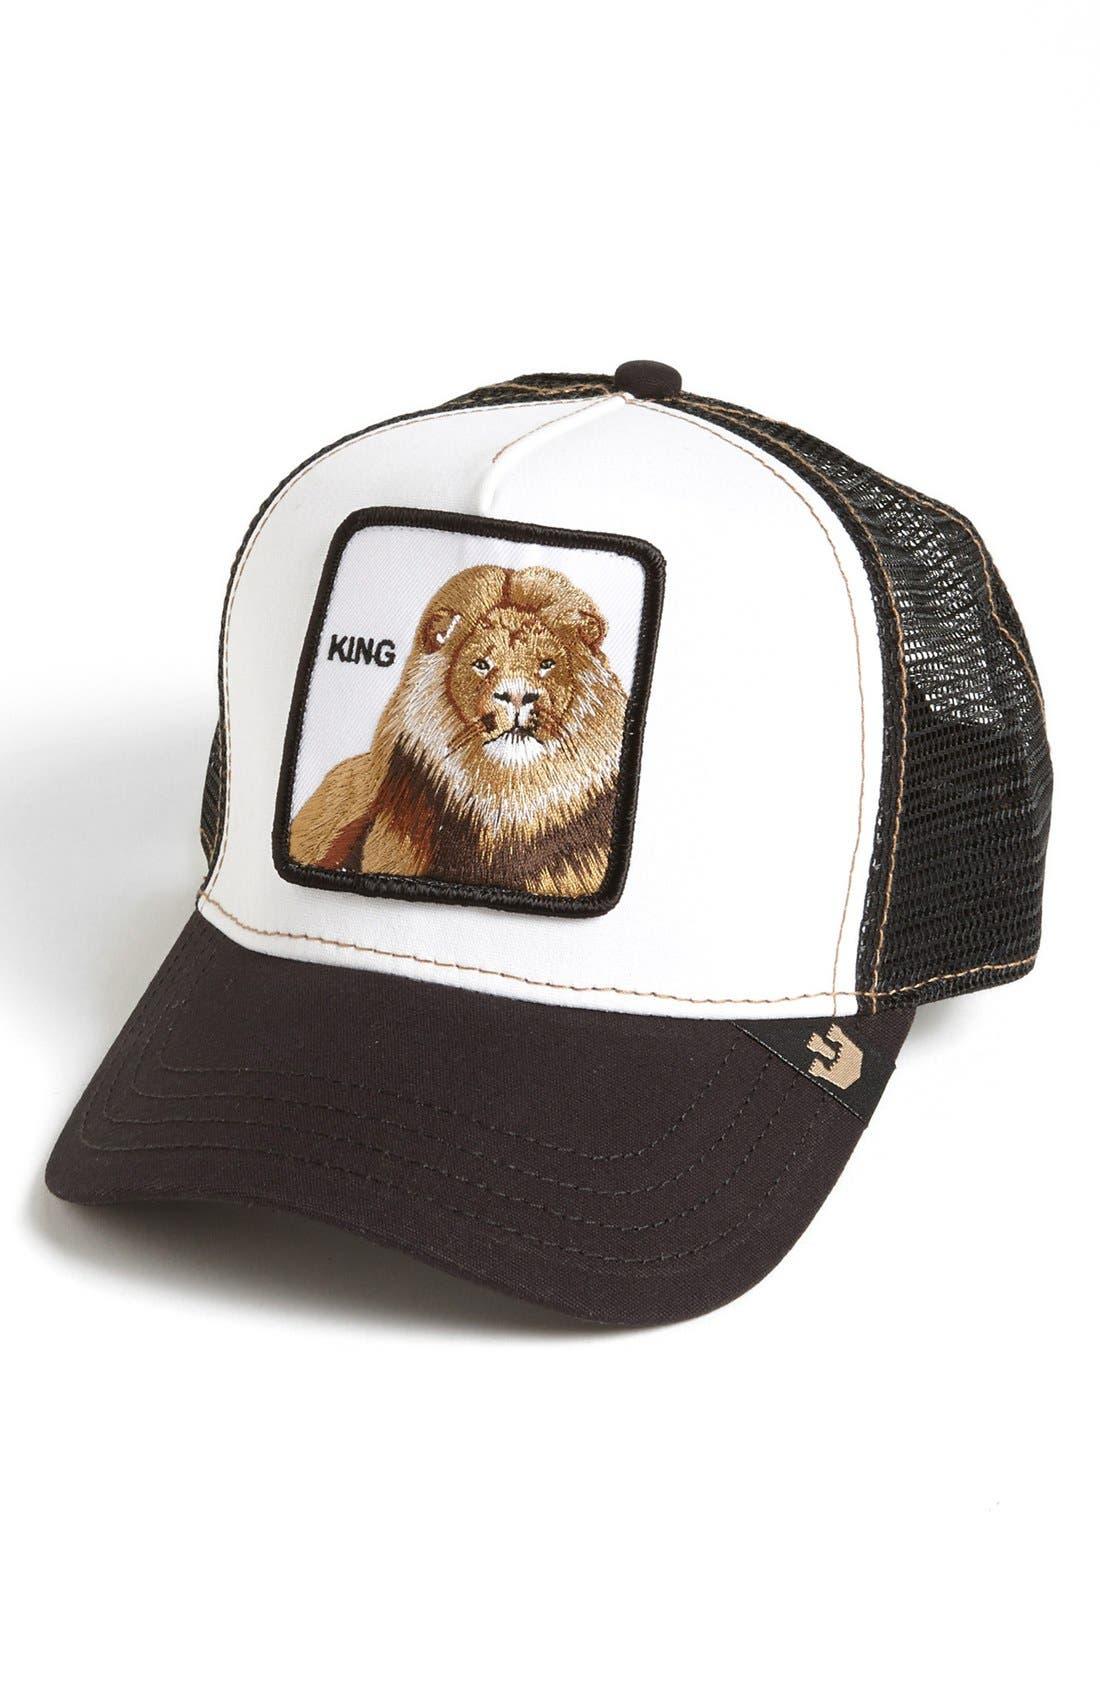 GOORIN BROTHERS 'Animal Farm - King' Trucker Hat, Main, color, BLACK